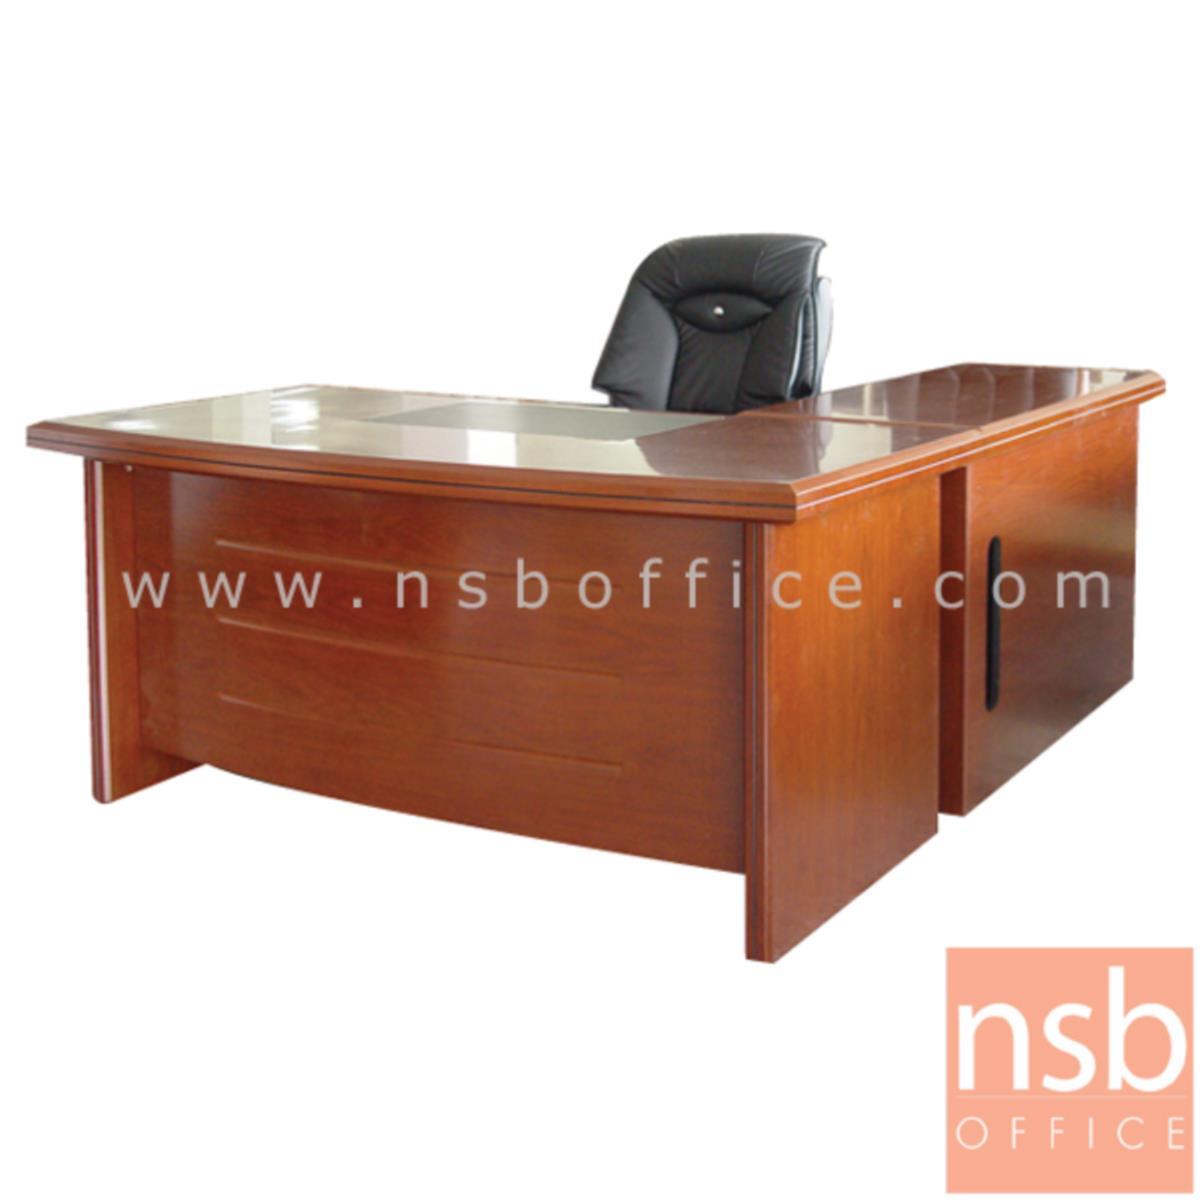 A06A055:โต๊ะผู้บริหารตัวแอล  รุ่น Campbell (แคมป์เบลล์) ขนาด 160W cm. พร้อมตู้ข้างและตู้ลิ้นชัก